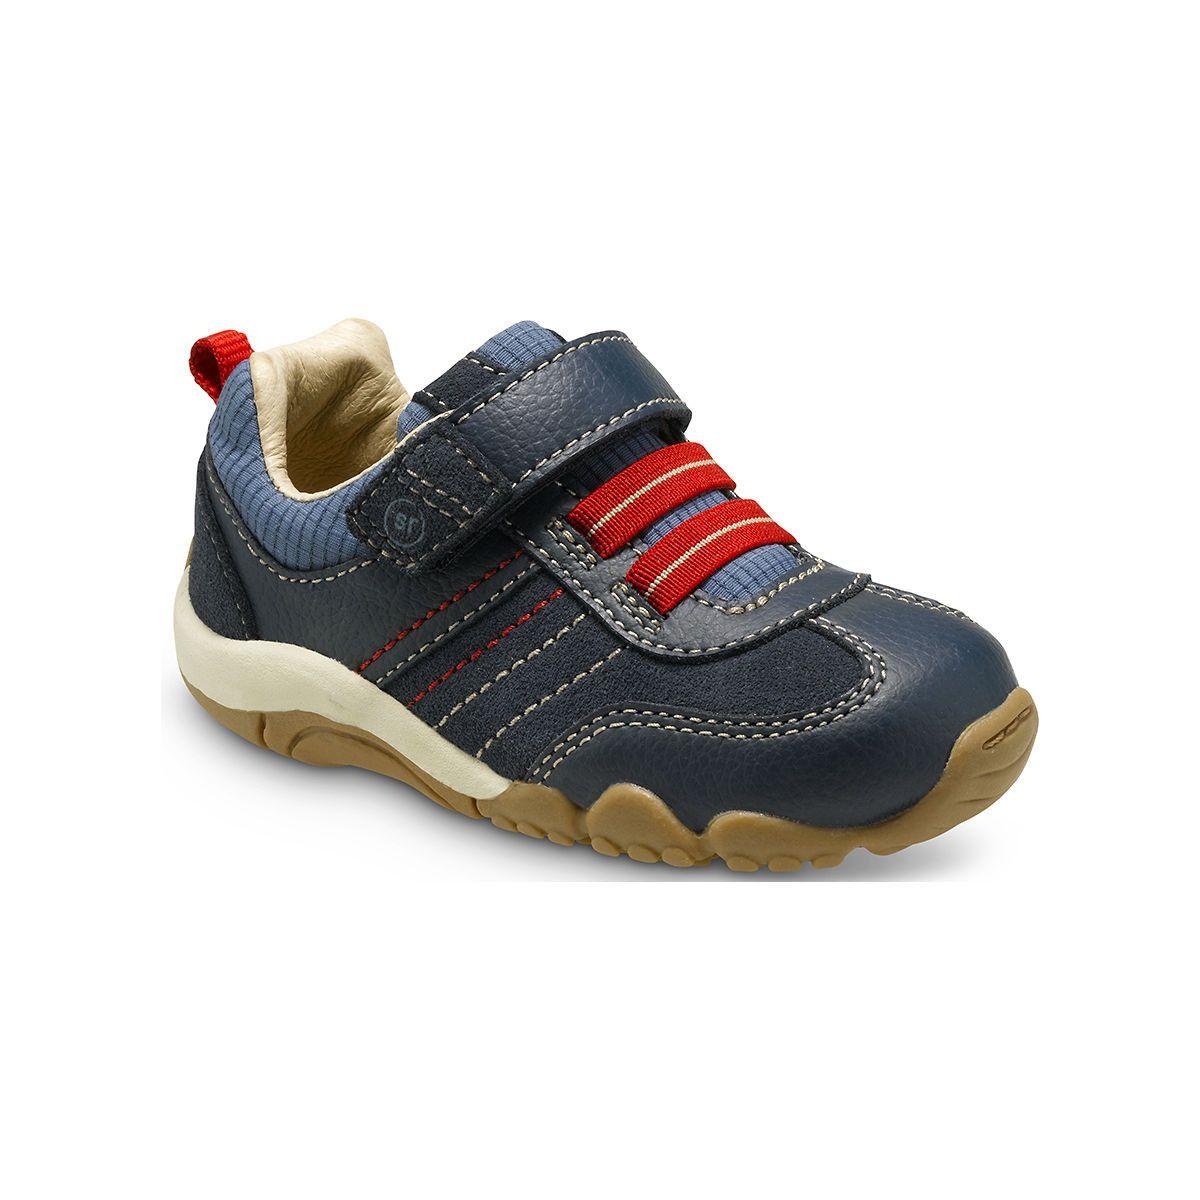 Stride Rite SRT Prescott Sneaker in Blue -  - Little Feet Childrens Shoes. #Striderite #prescott #sneaker #blue #red #cuteboyshoes #stafffavorite